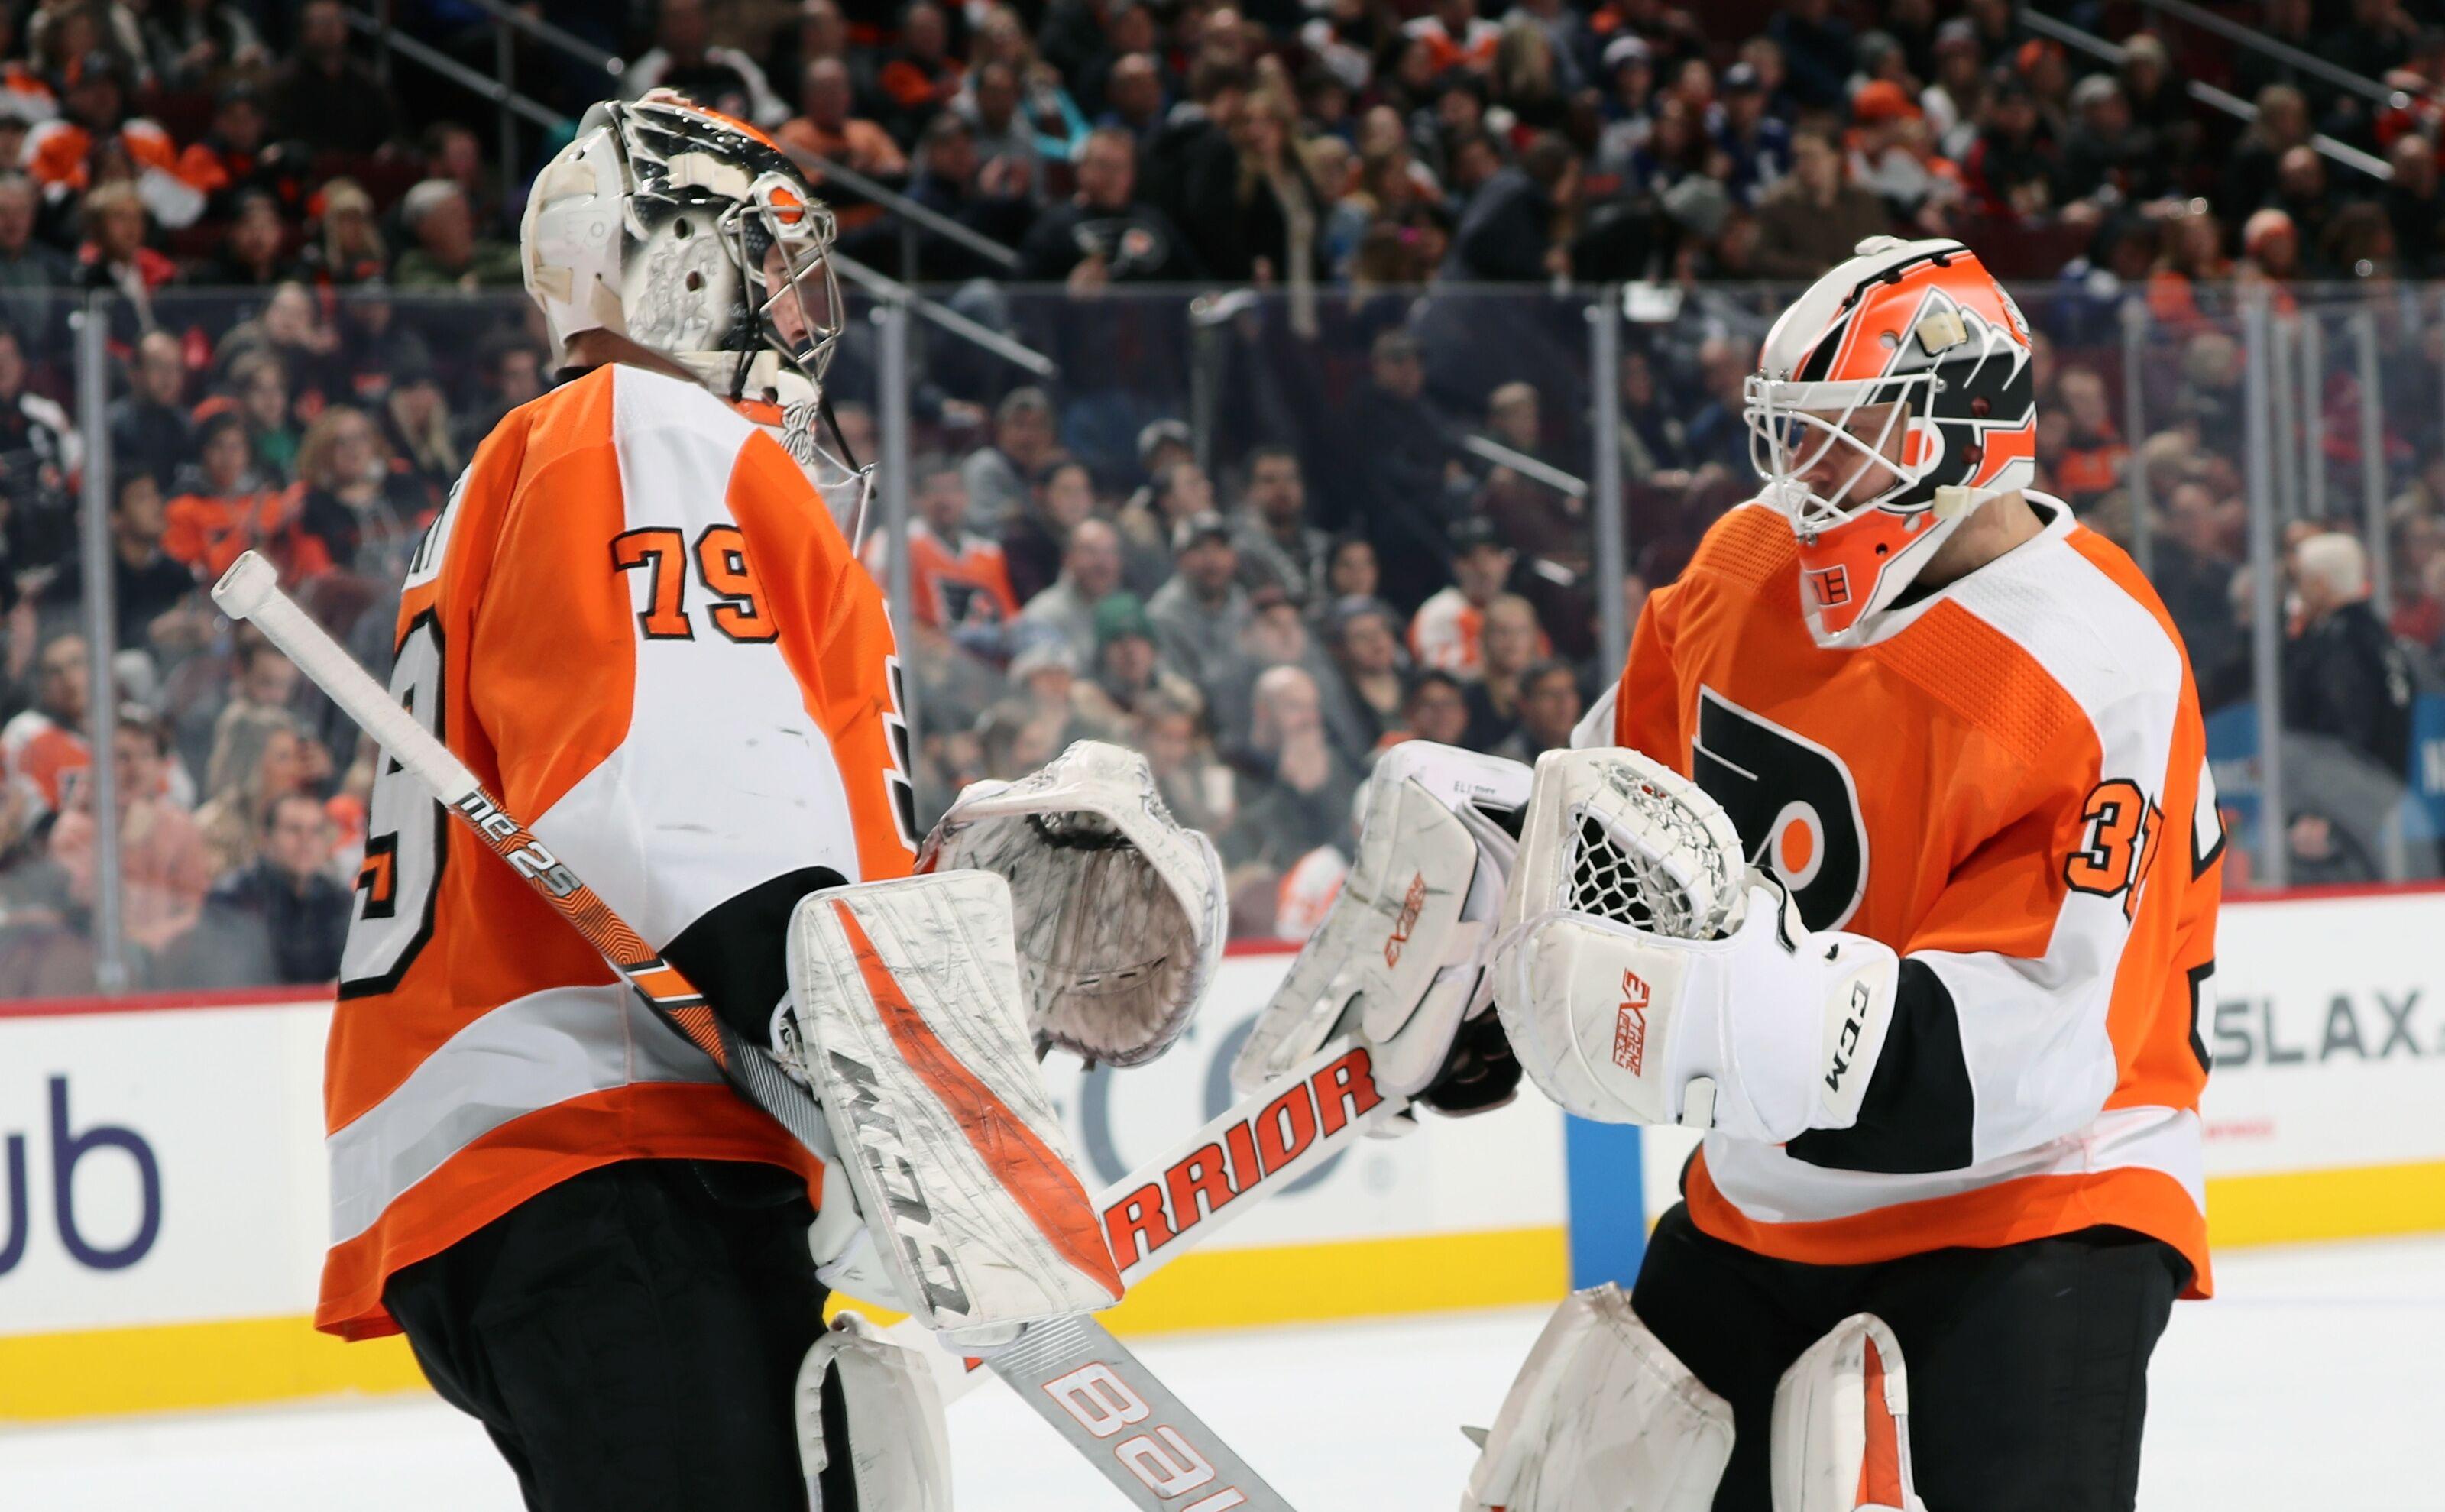 Philadelphia Flyers Who Else Could Fill The Backup Goaltending Role